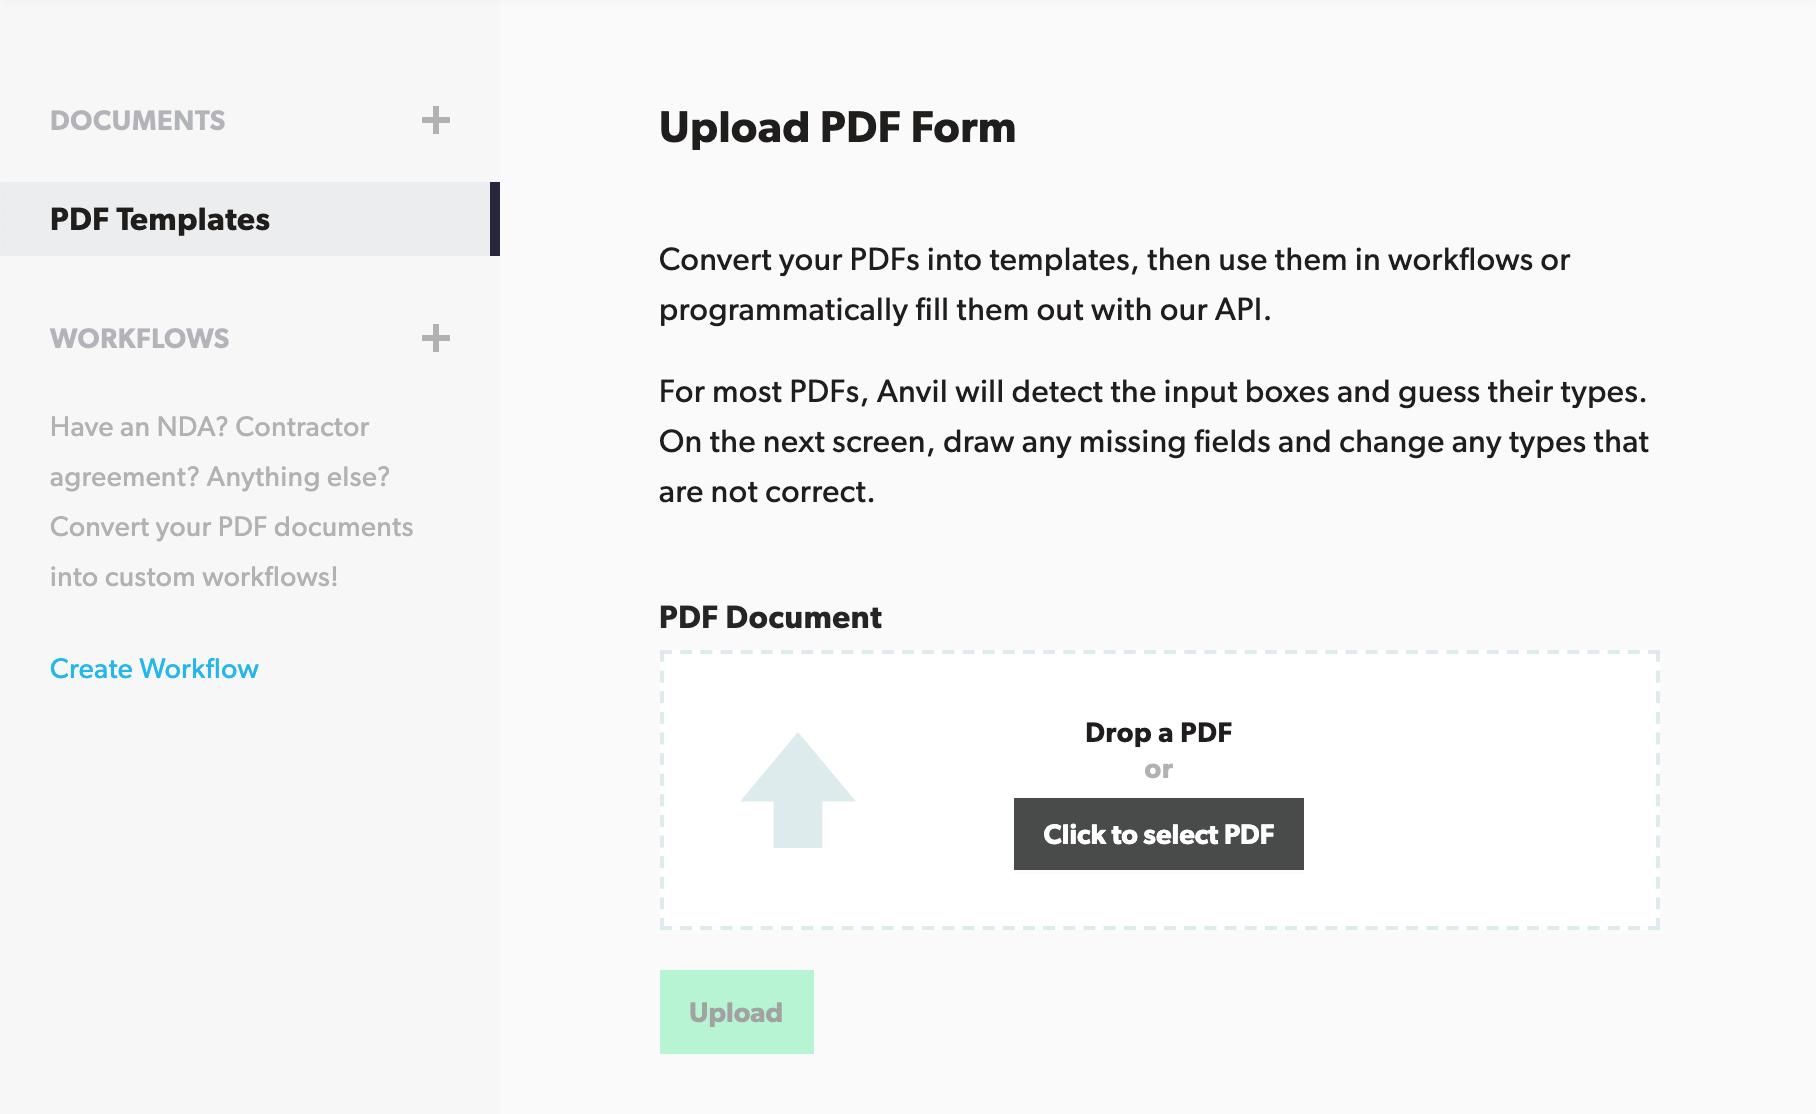 Uploading a PDF Form